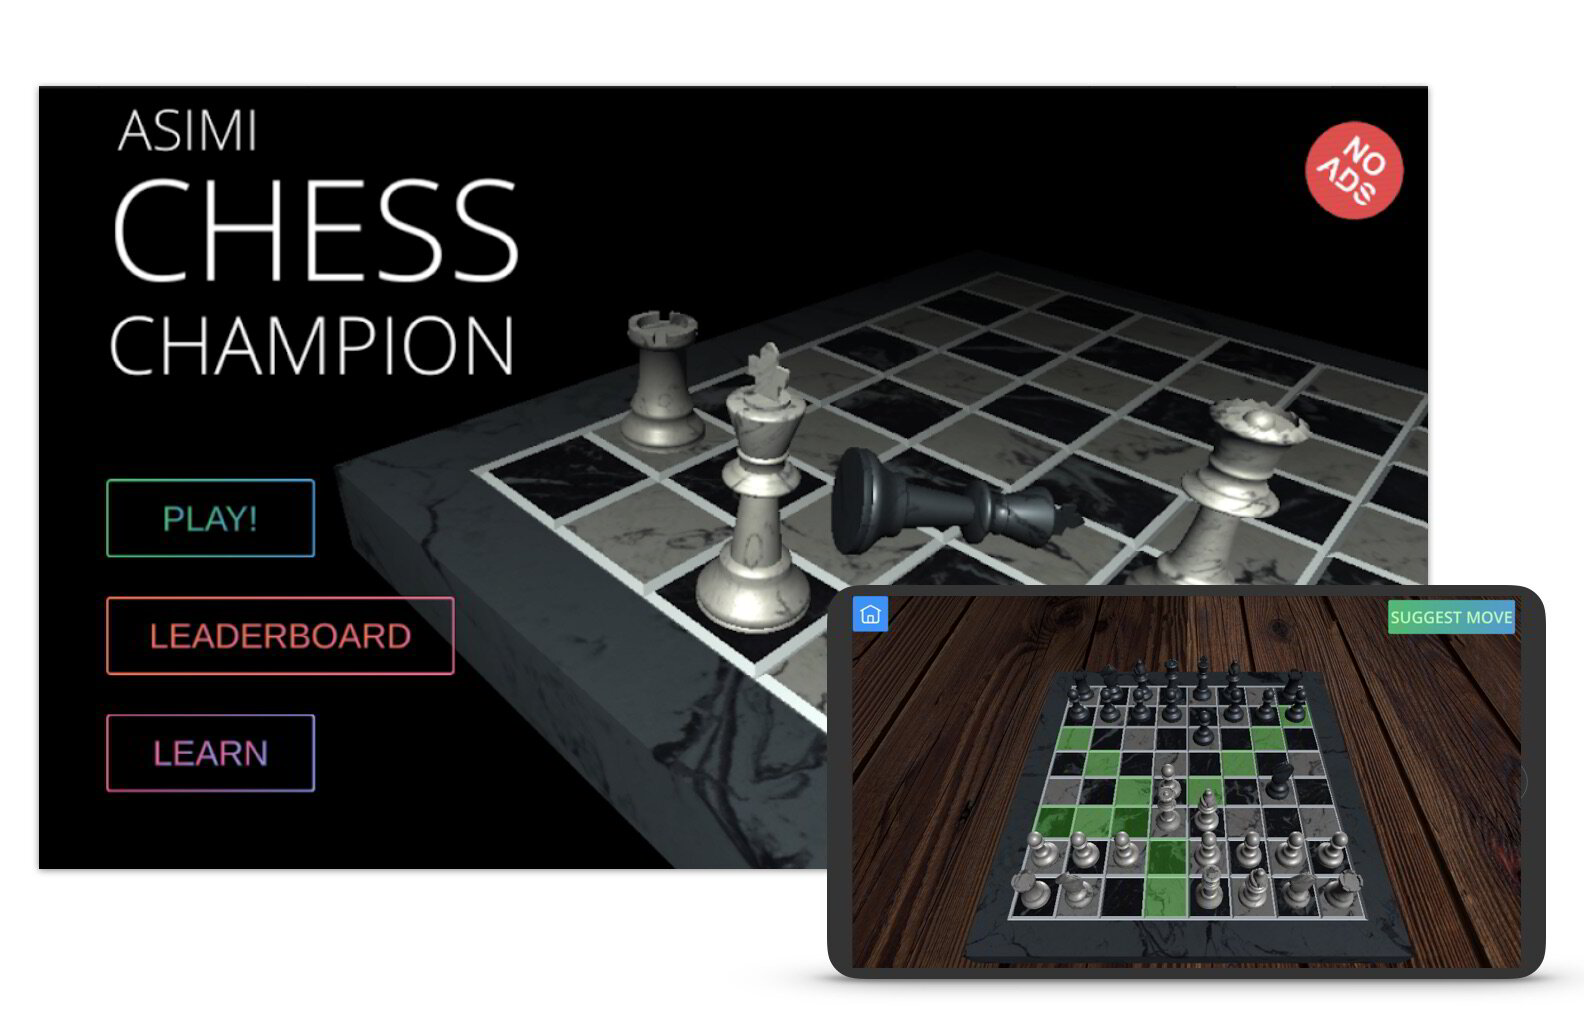 Asimi play chess champion